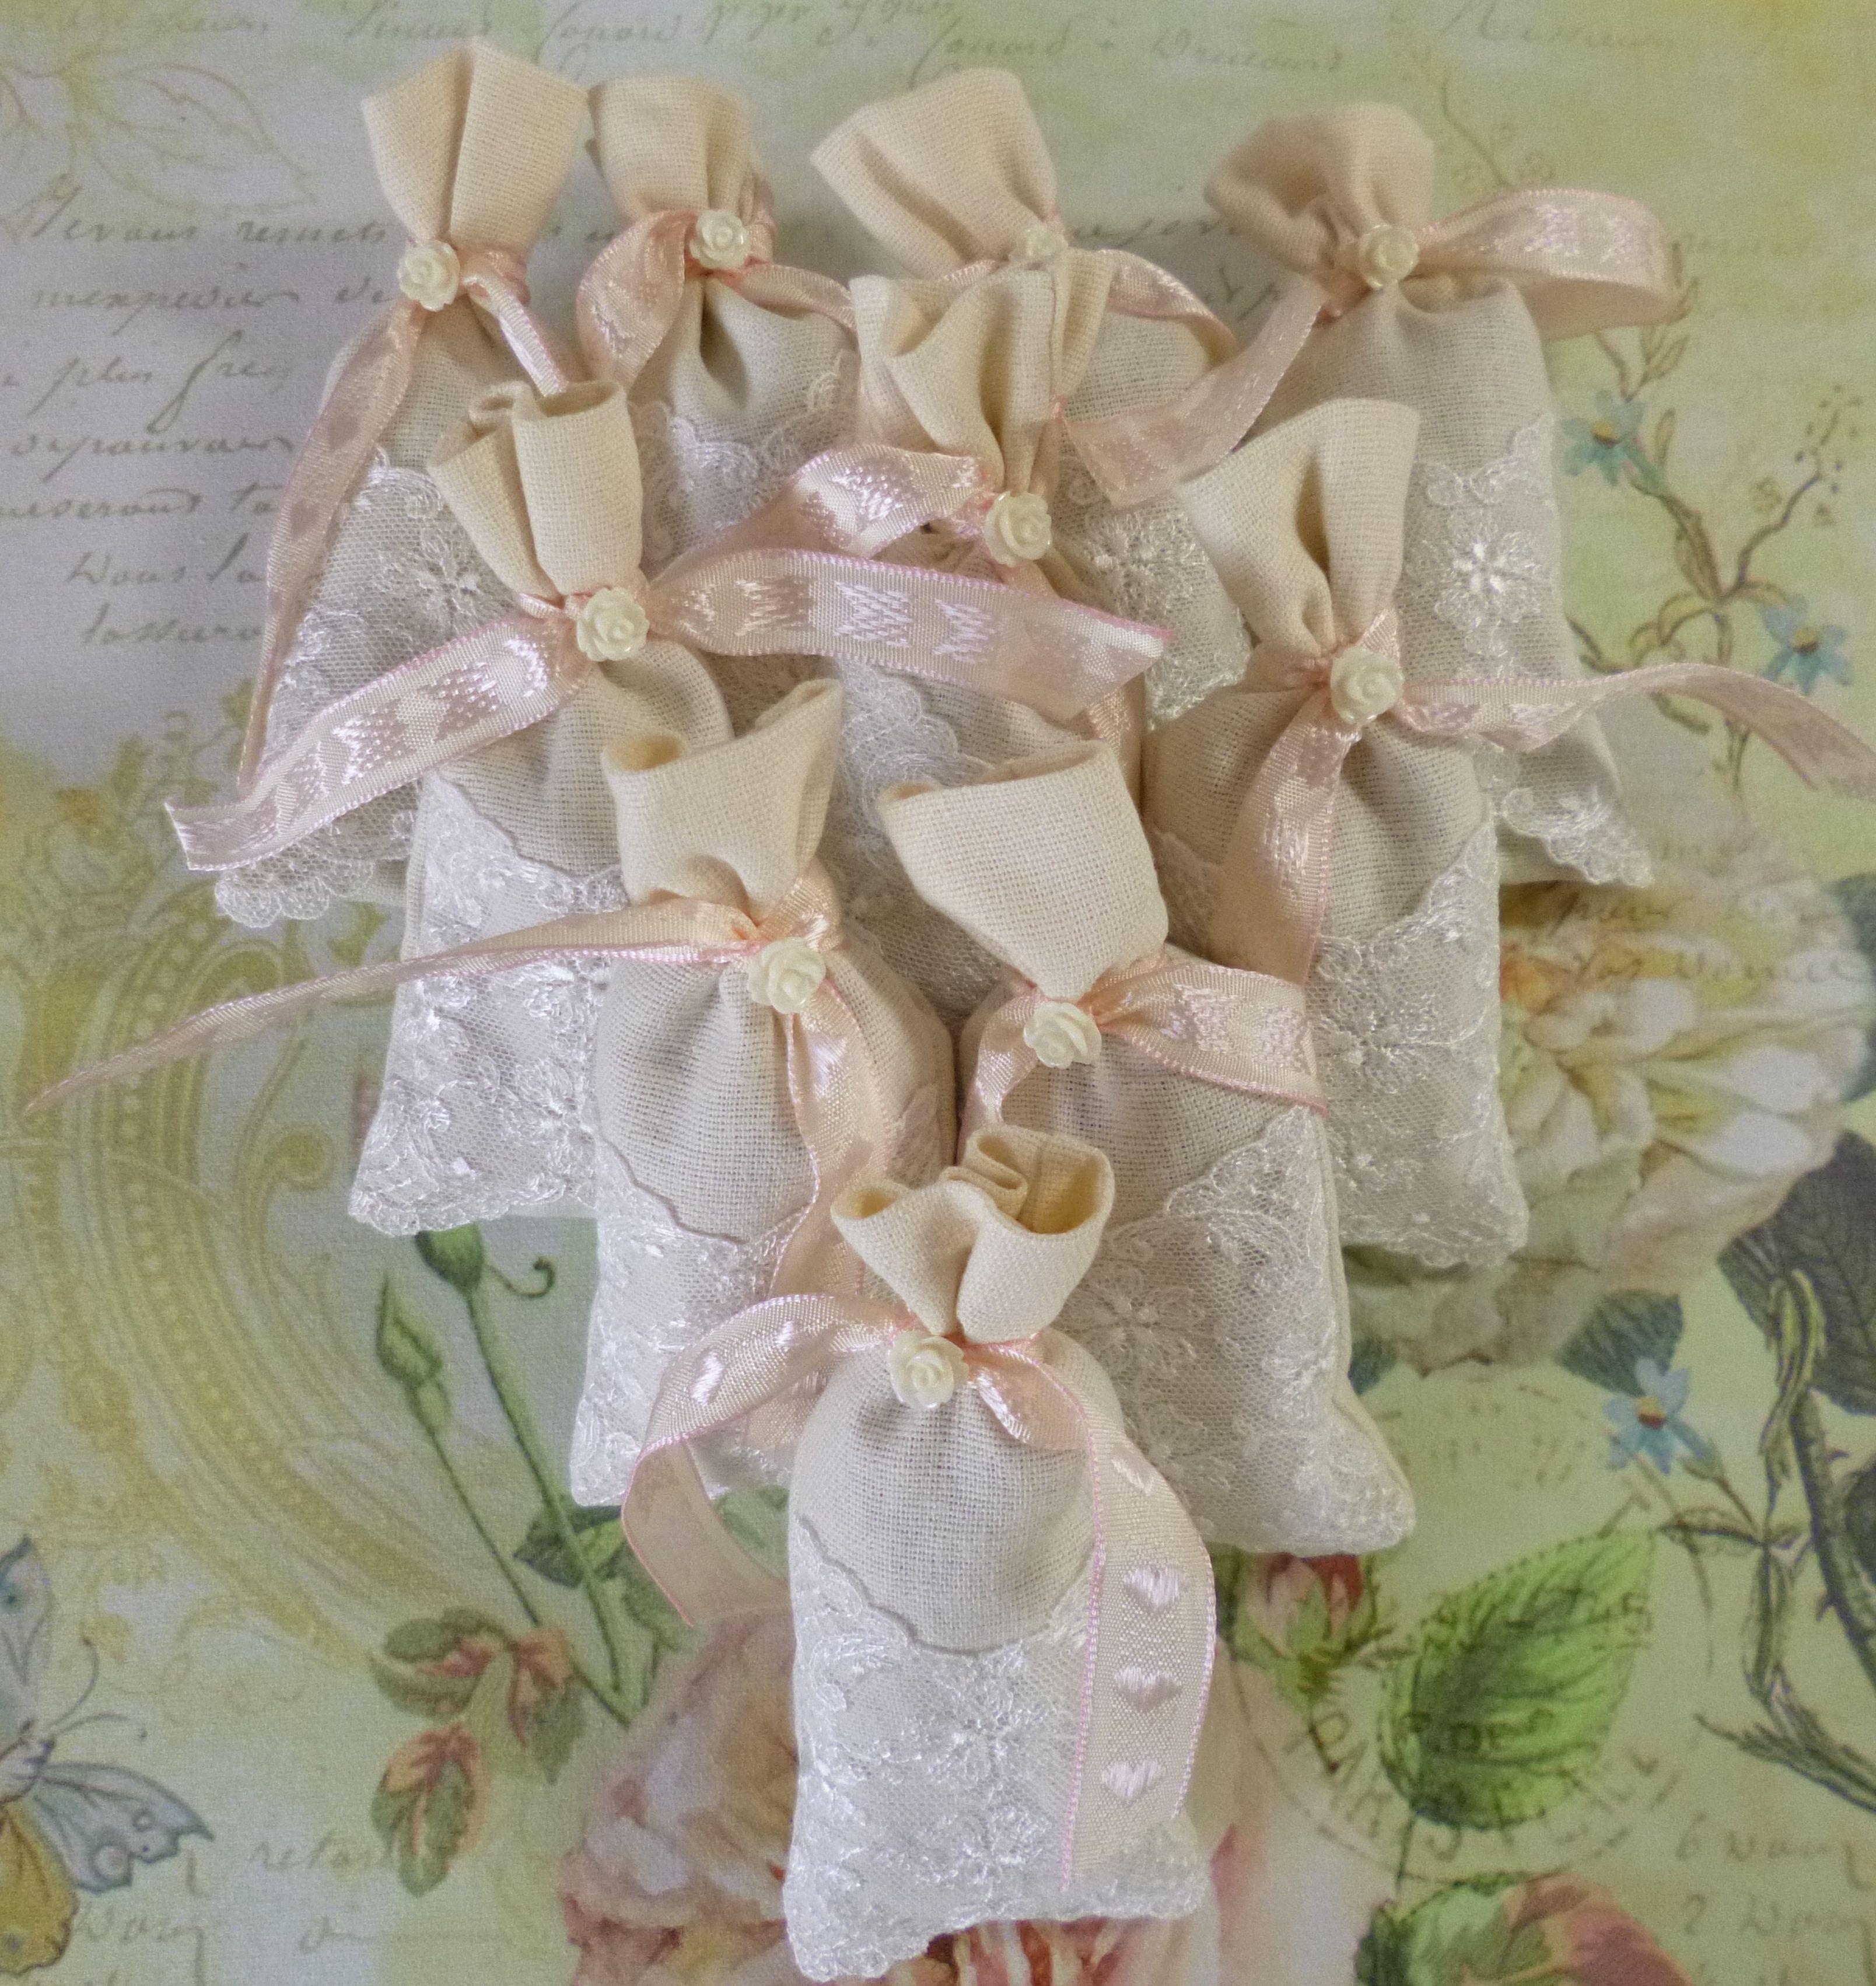 Linen and Lace lavender sachets